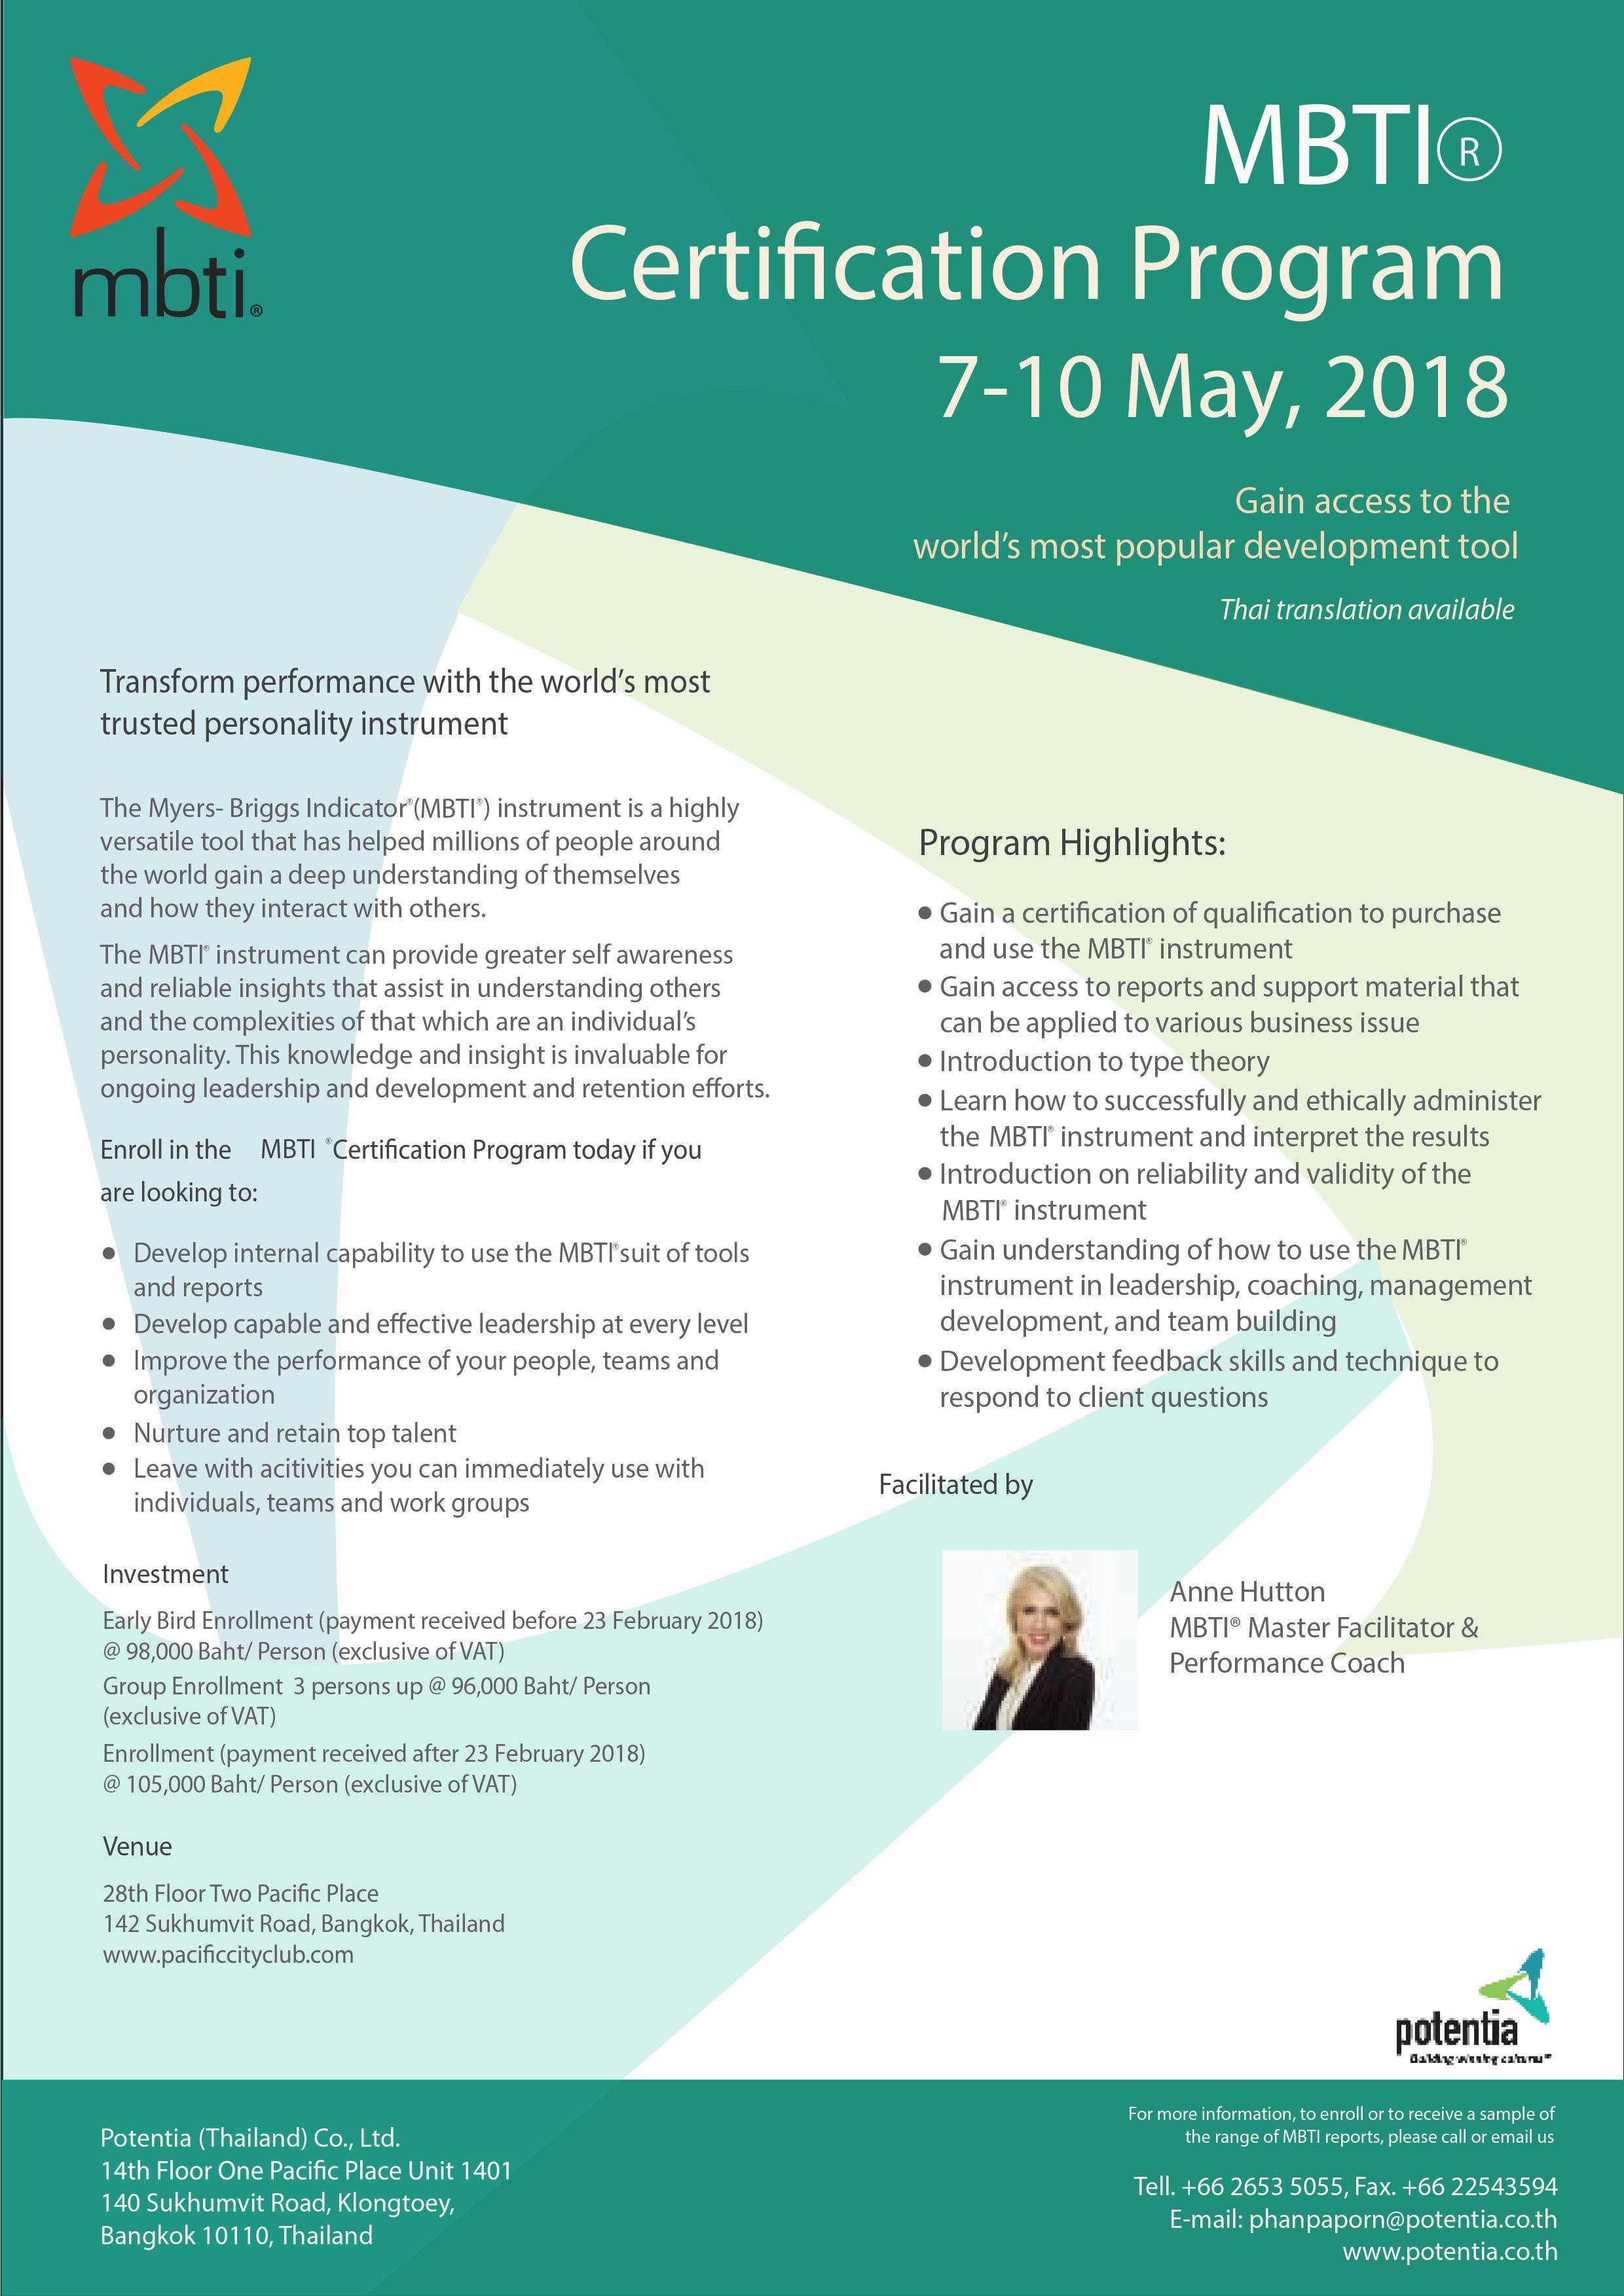 Mbti Certification Program May 7 10 2018 7 May 2018